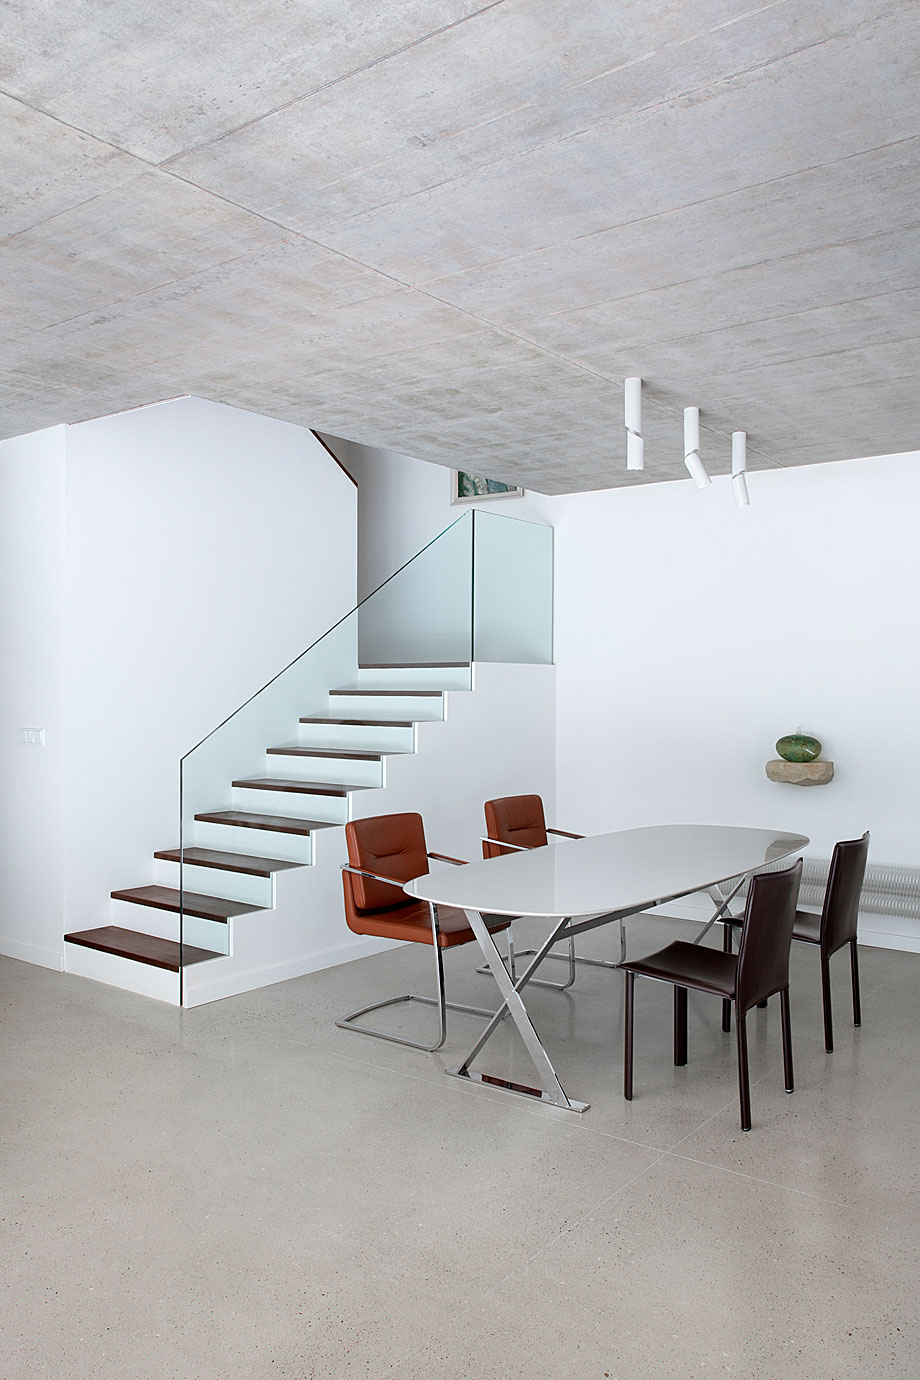 casa-unifamiliar-klanovice-adr-architects-1